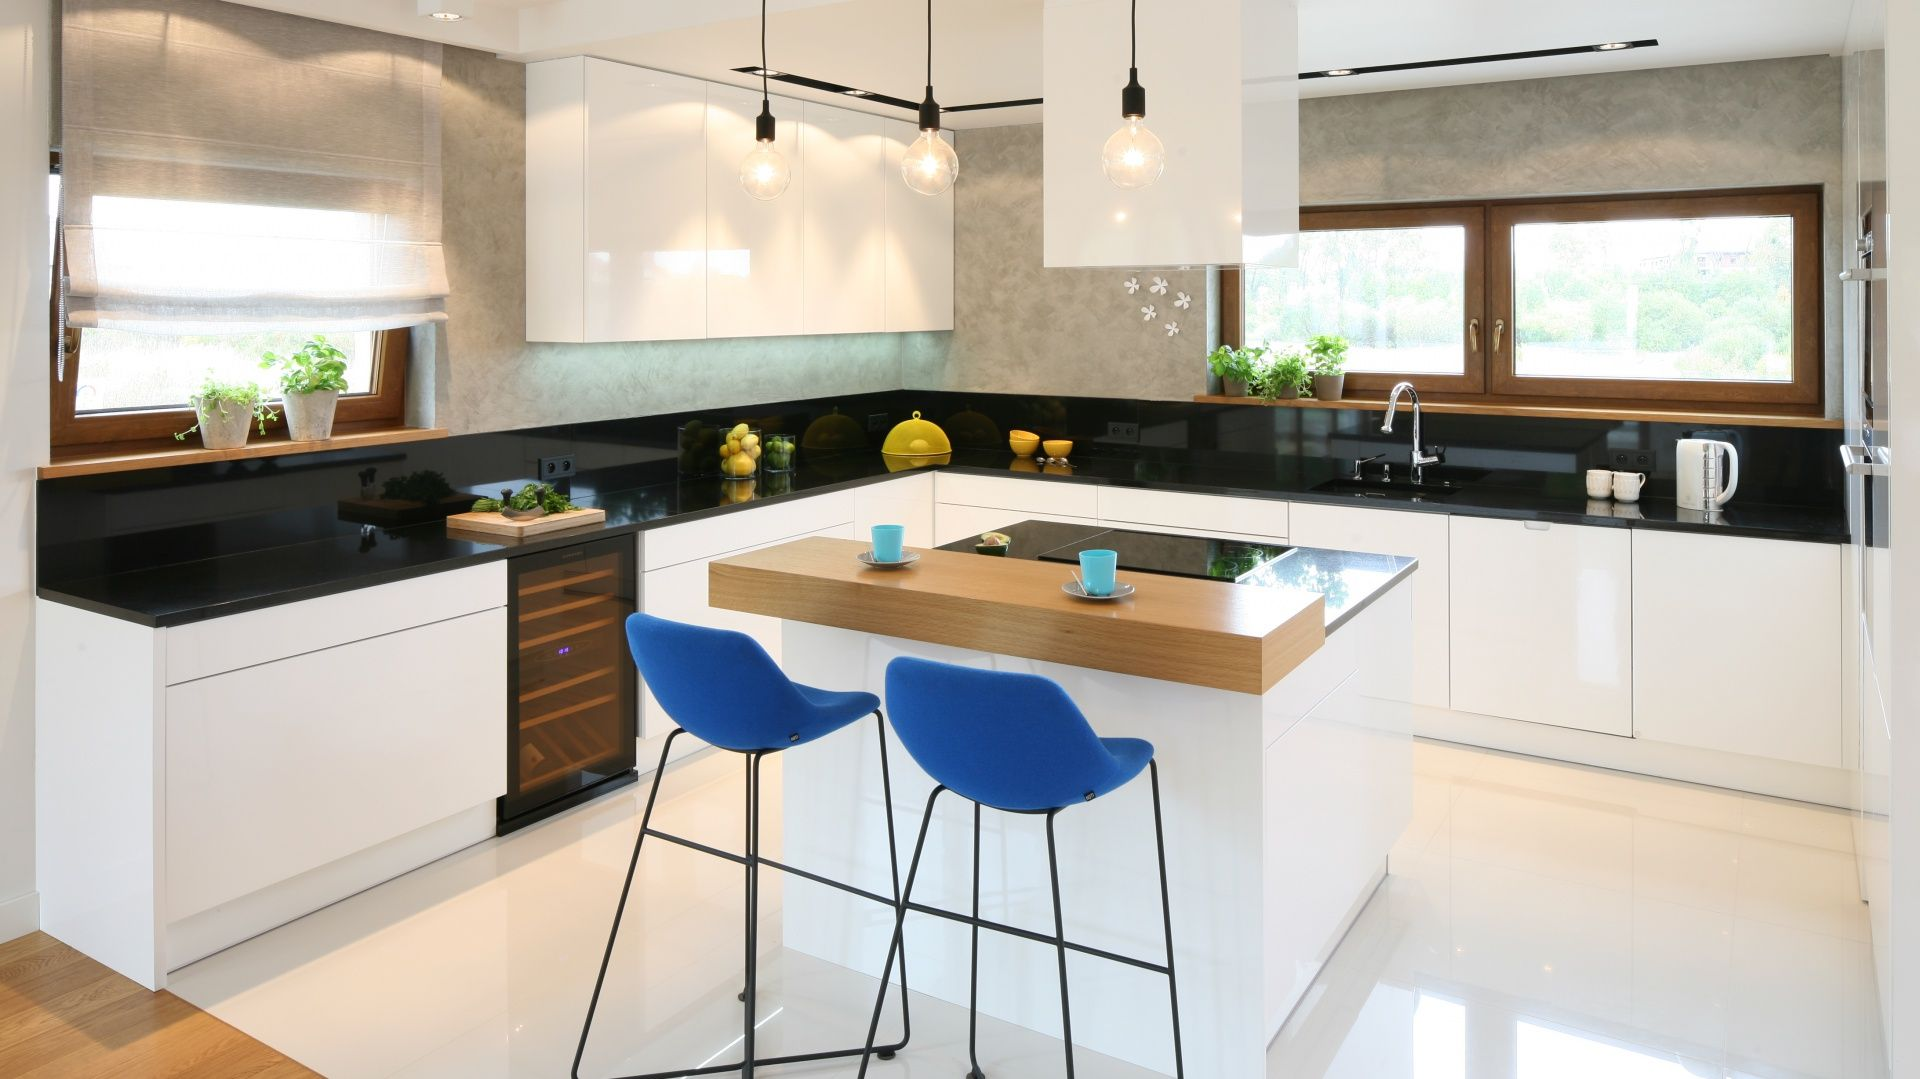 Wyspa W Kuchni Szukaj W Google Kitchen Inspirations Home Decor House Design